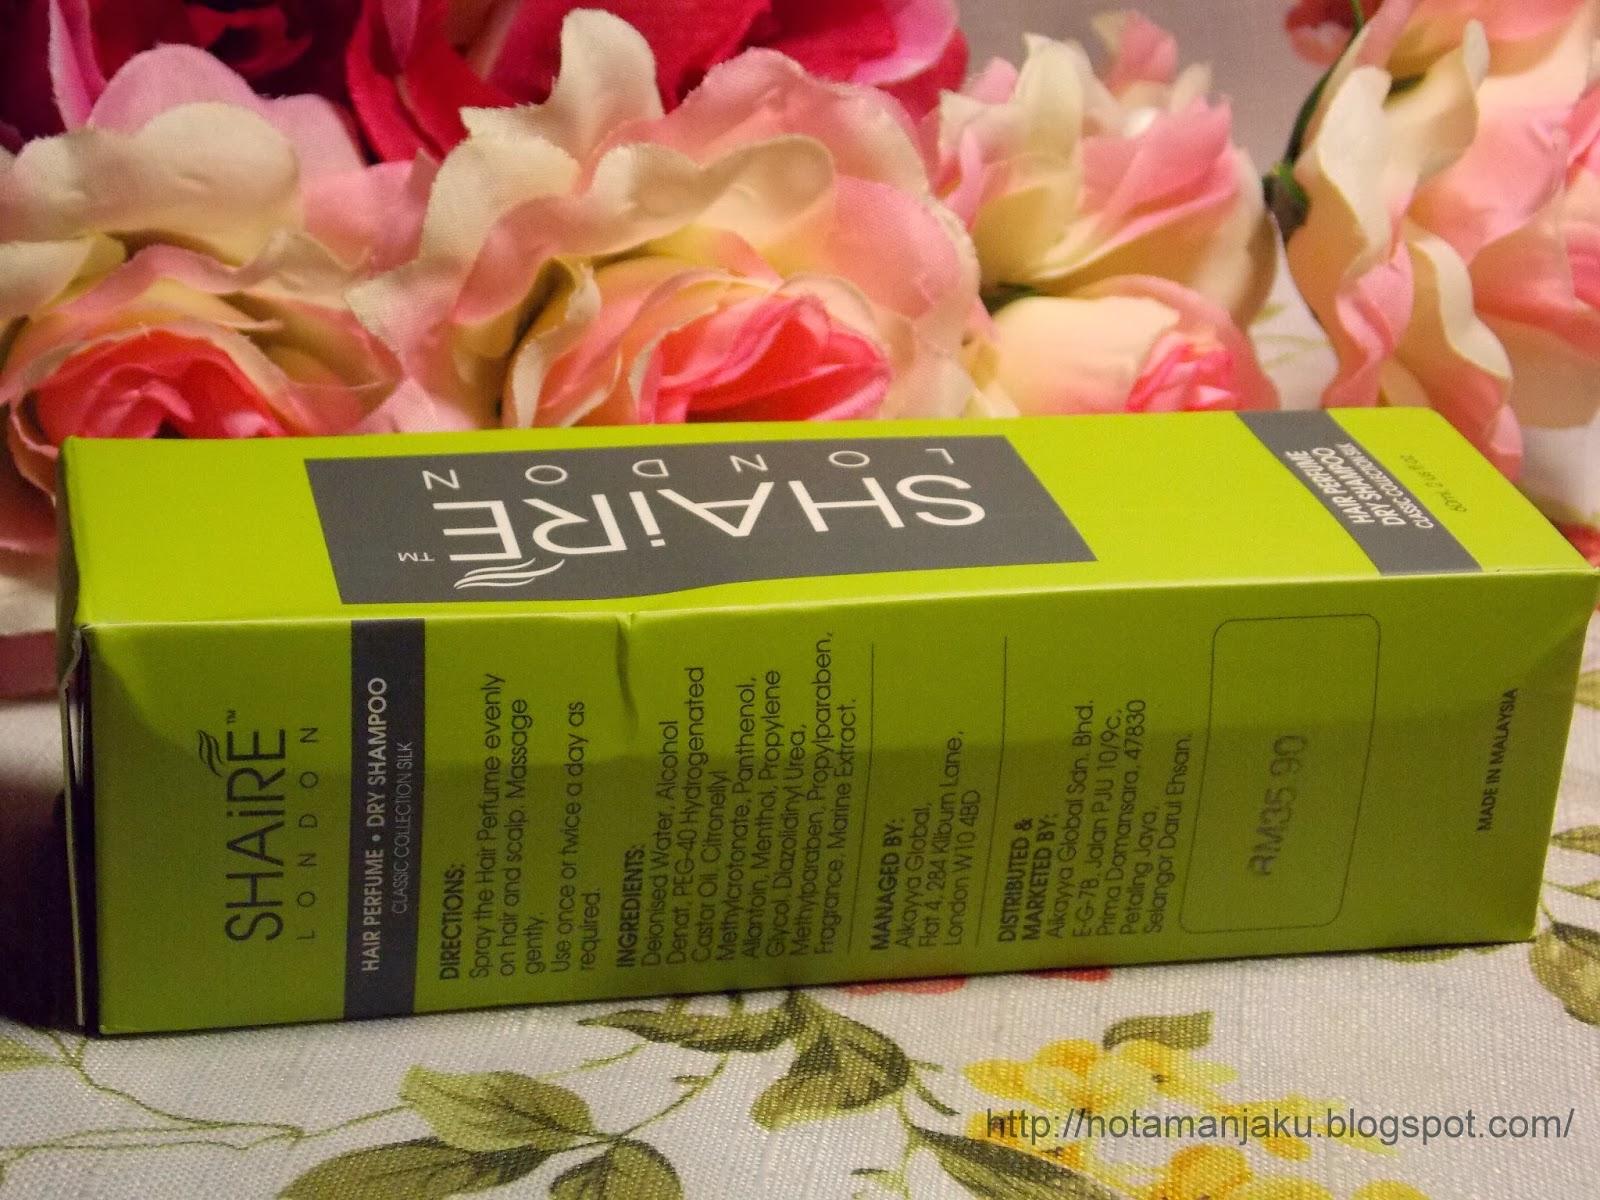 Hair perfume Dry shampoo